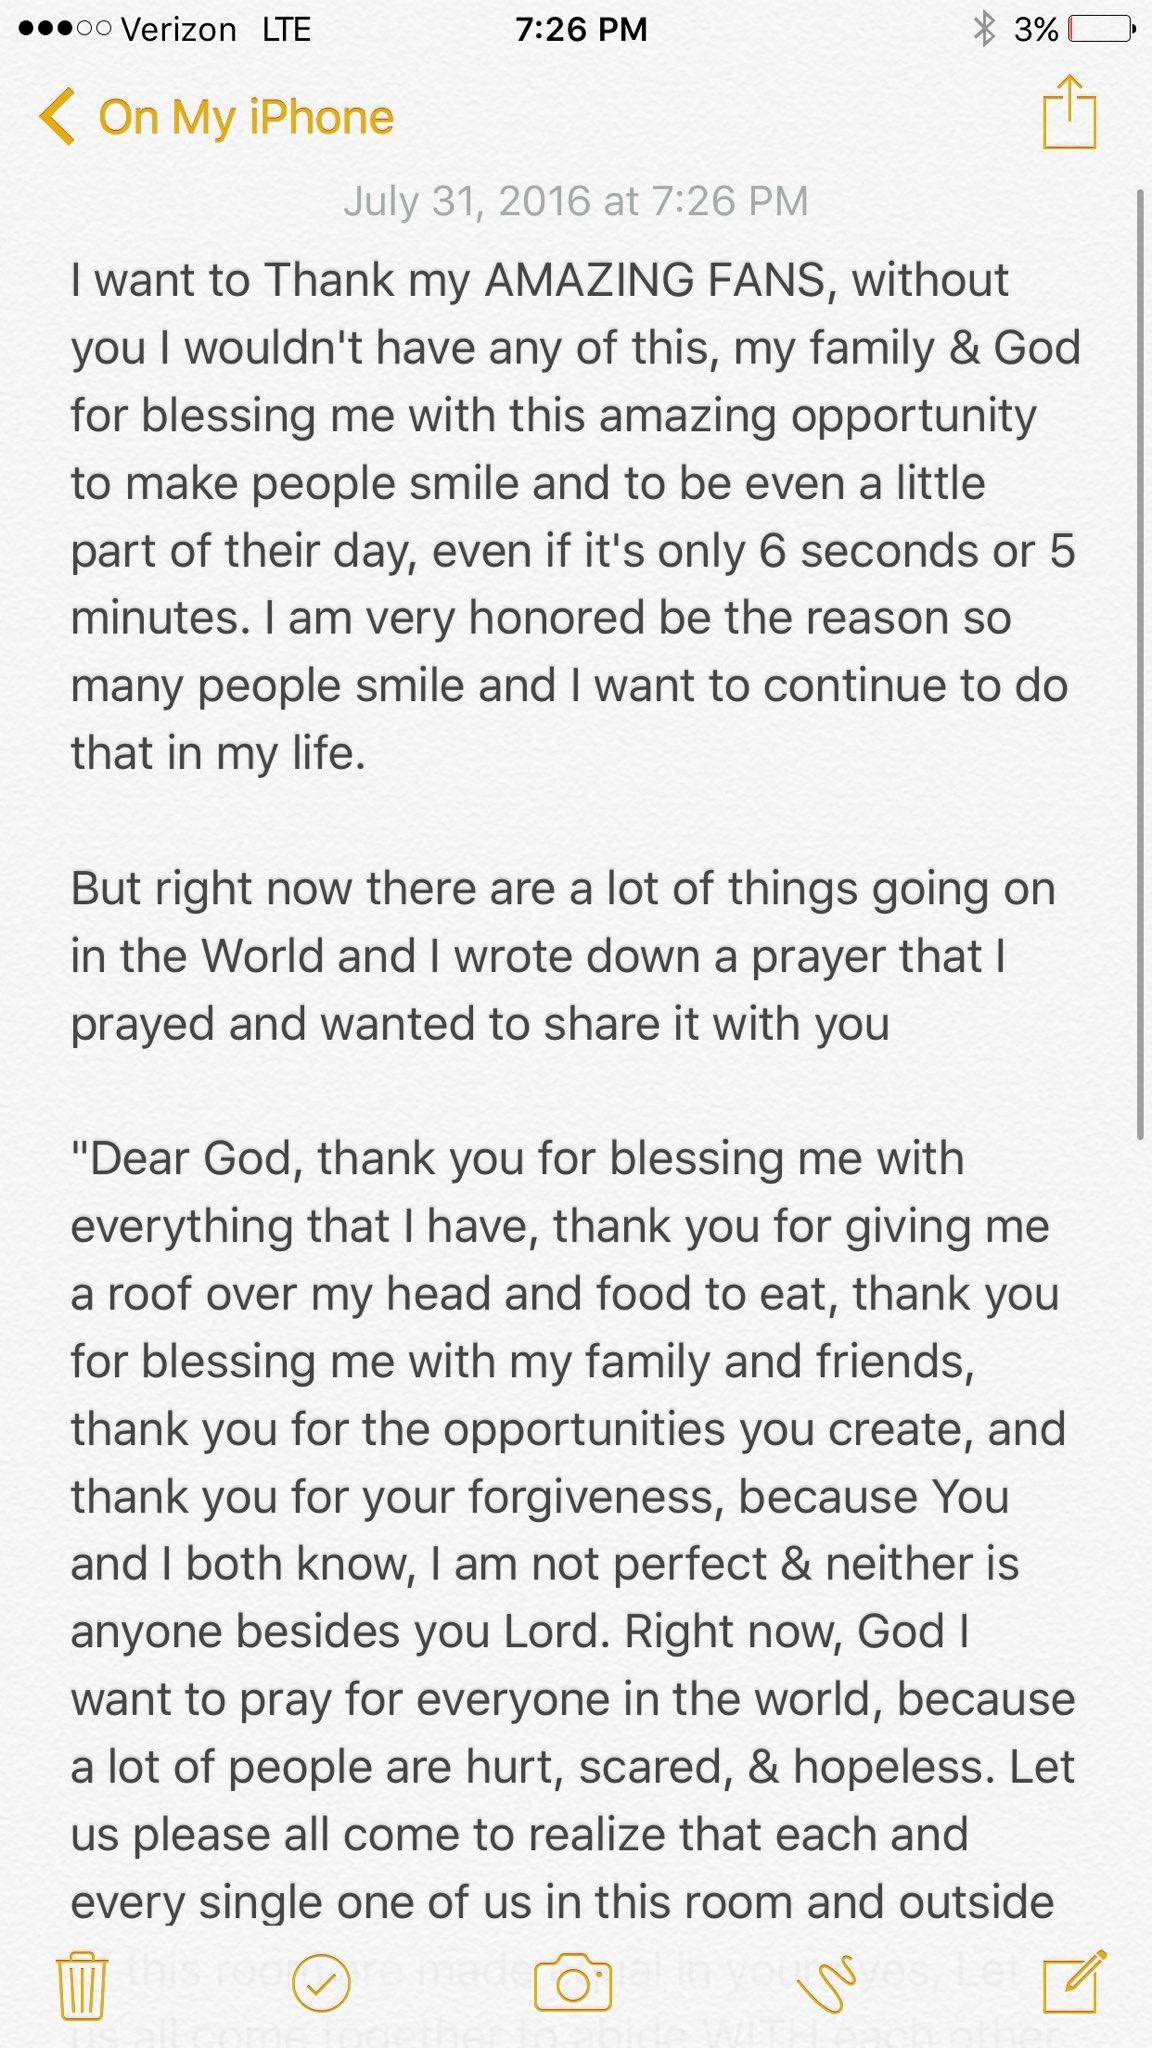 Thank you, https://t.co/1DH95MR8bA